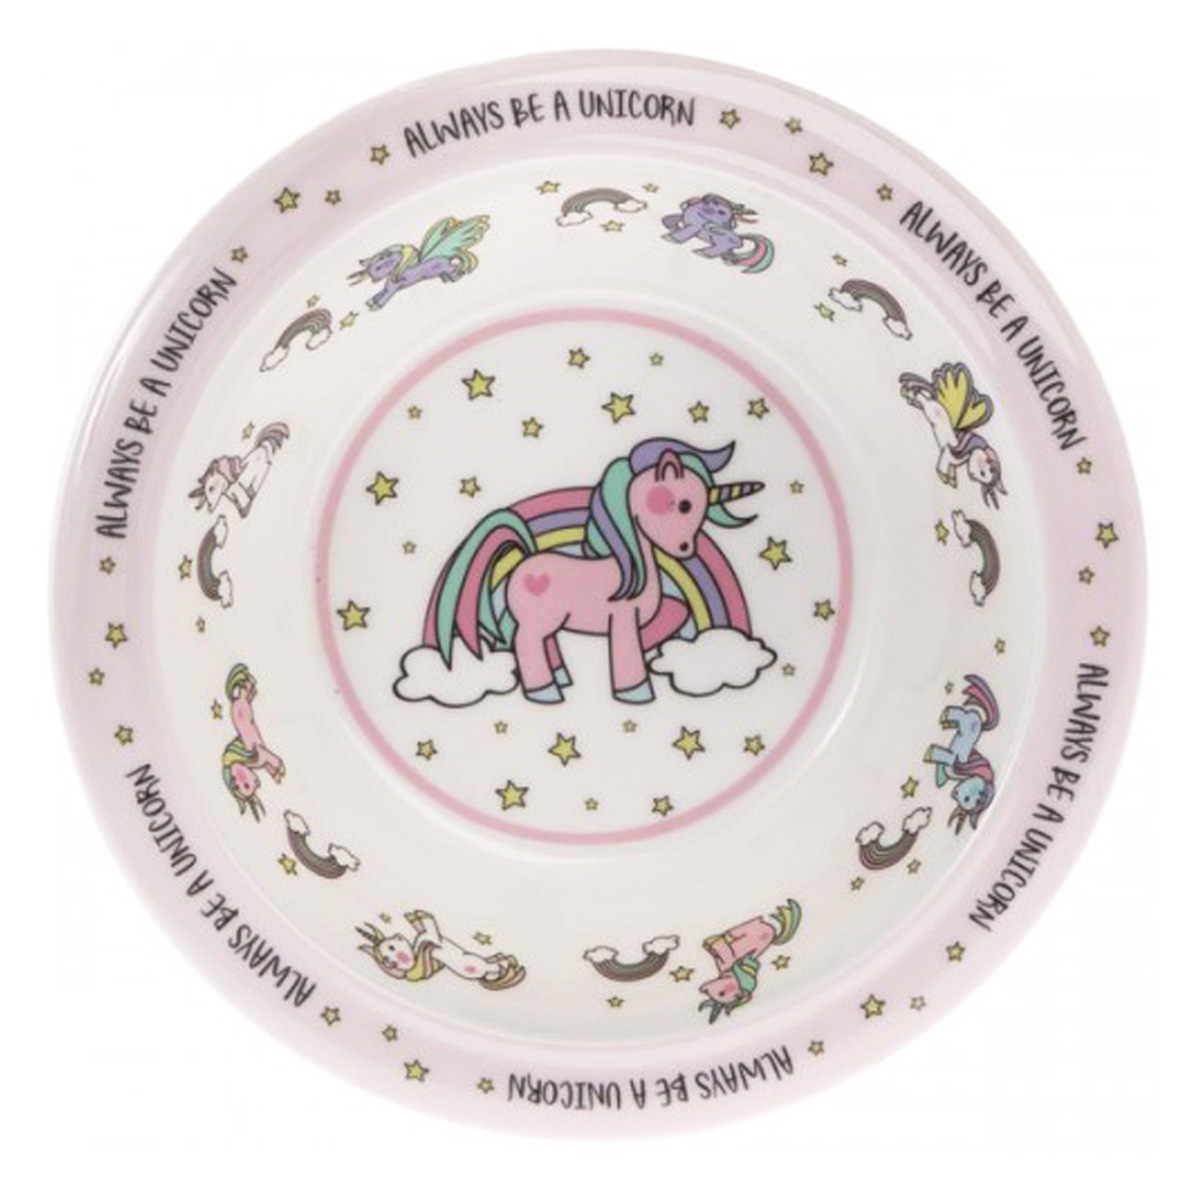 Bol enfant mélamine  \'Licorne My Unicorn\' rose blanc - 16x5 cm - [Q5550]